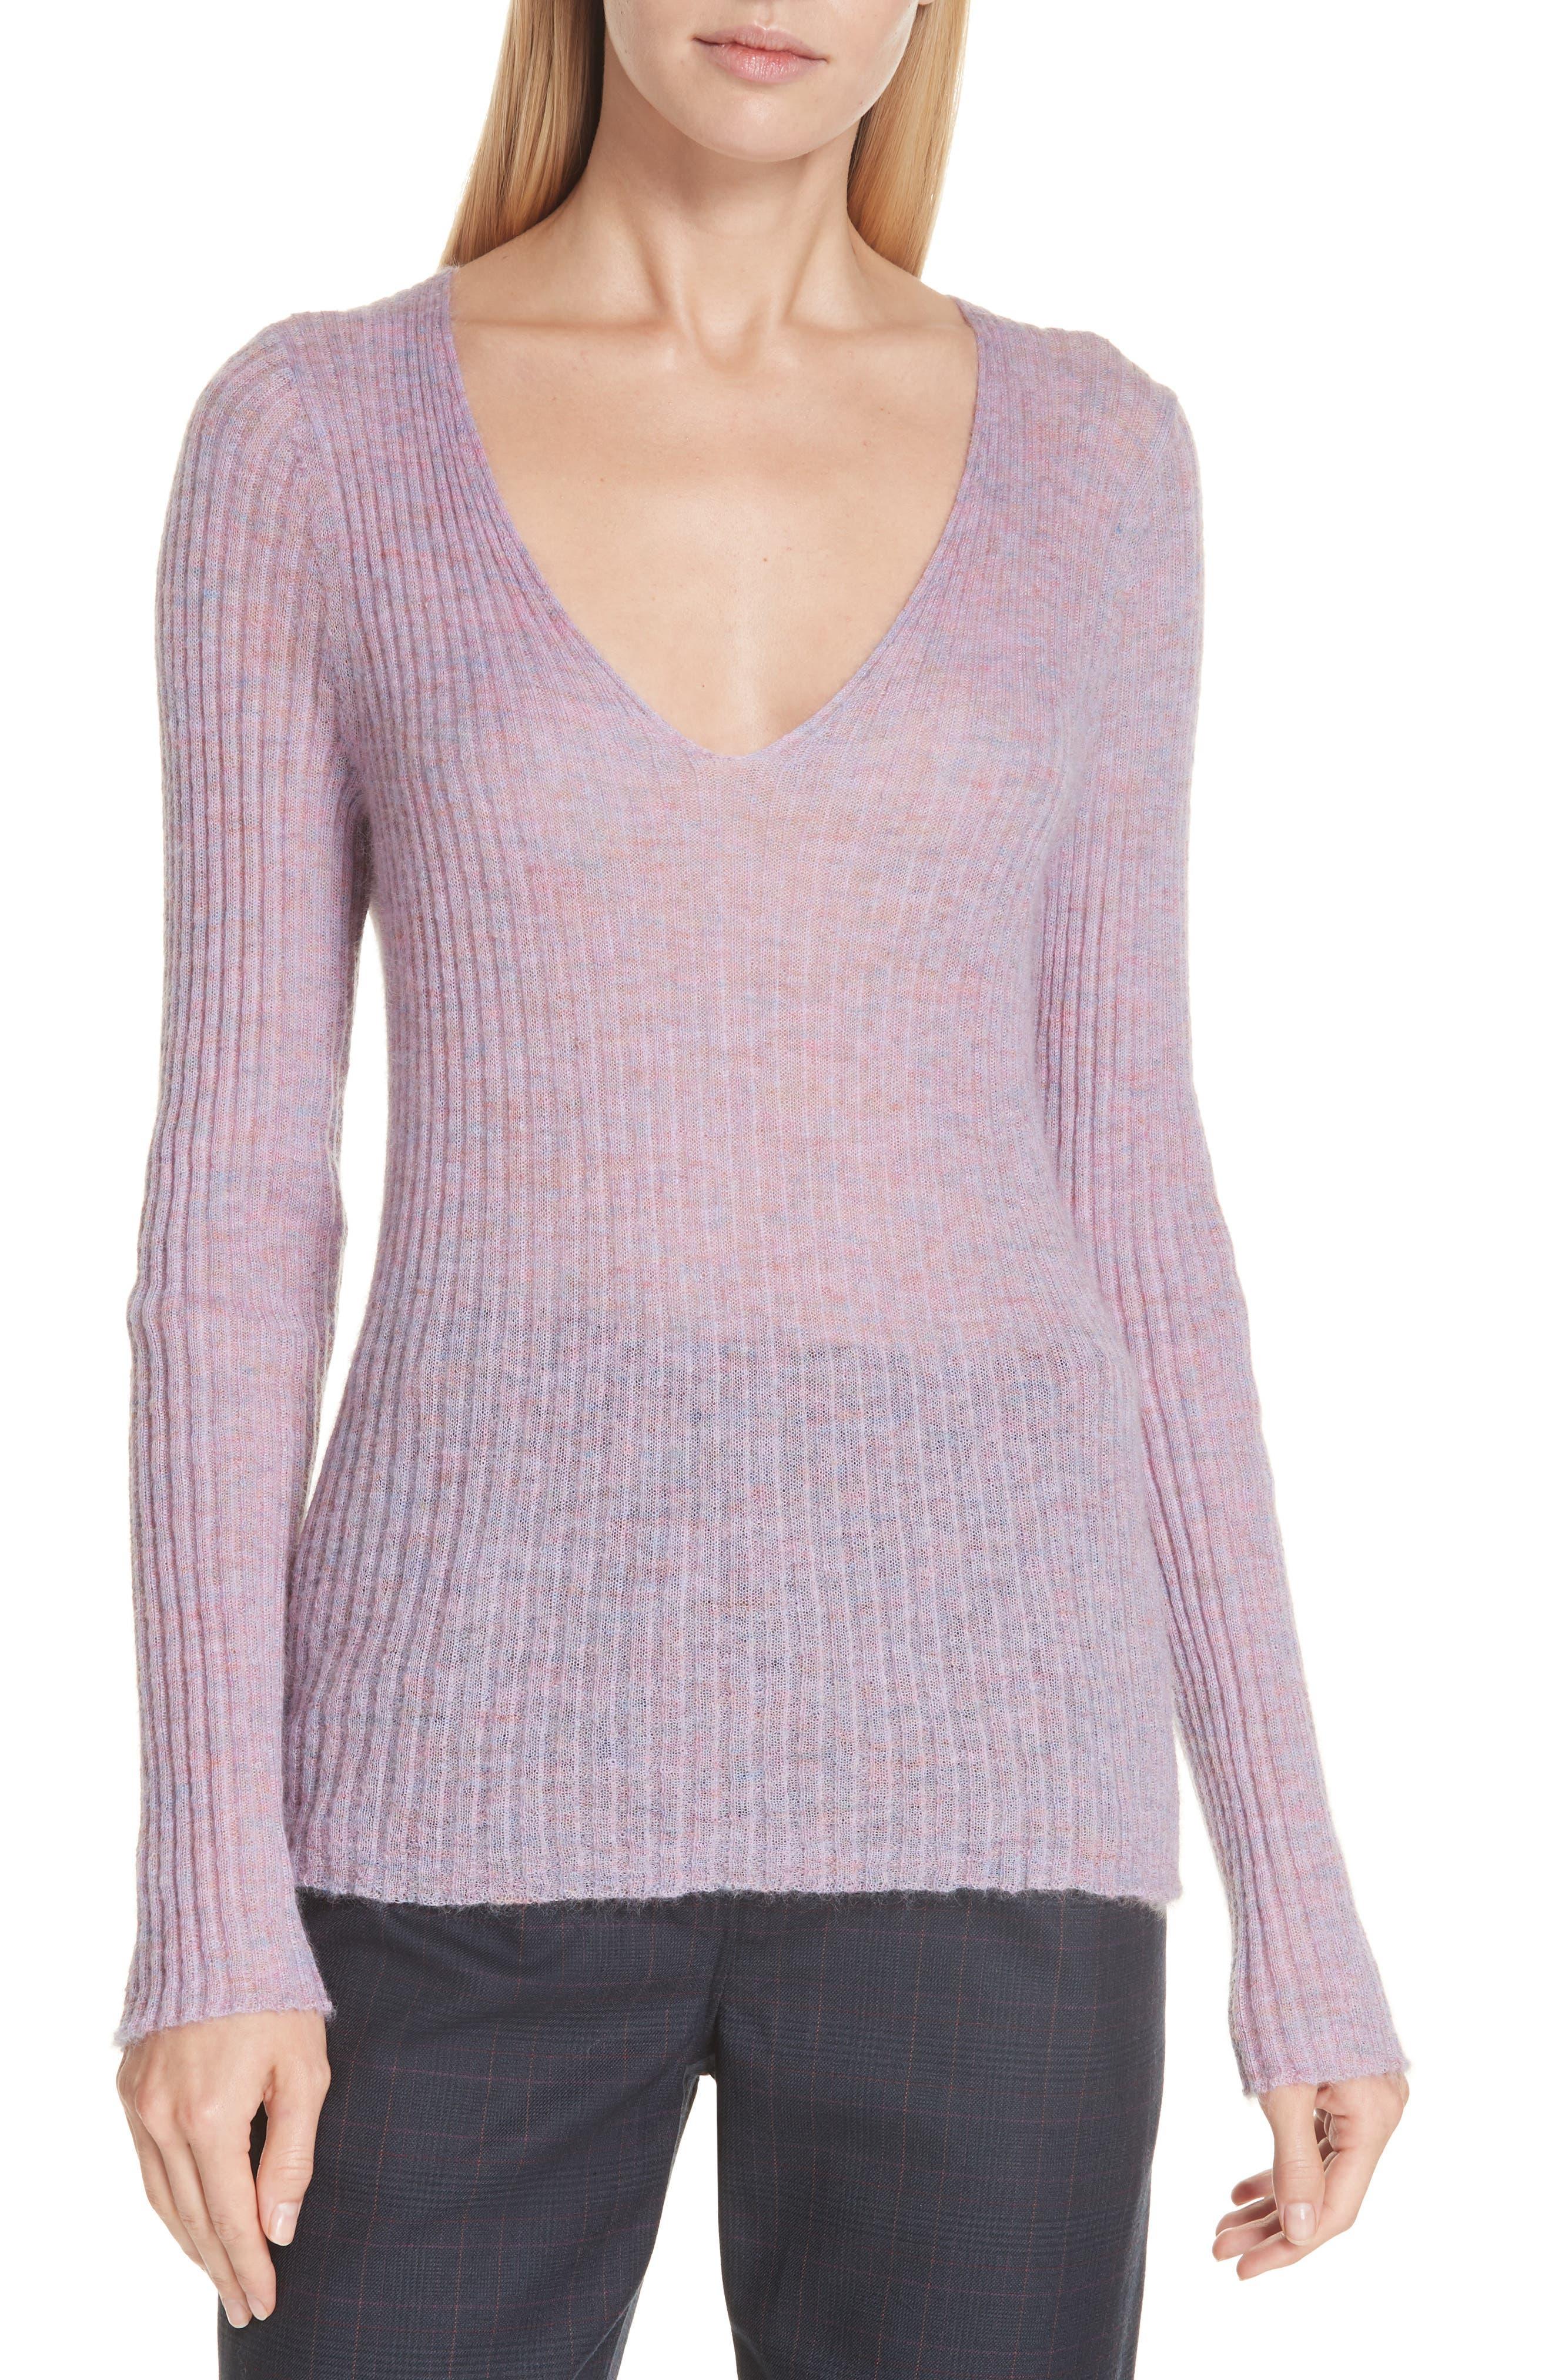 RAG & BONE Donna Mohair Blend Sweater, Main, color, LILAC